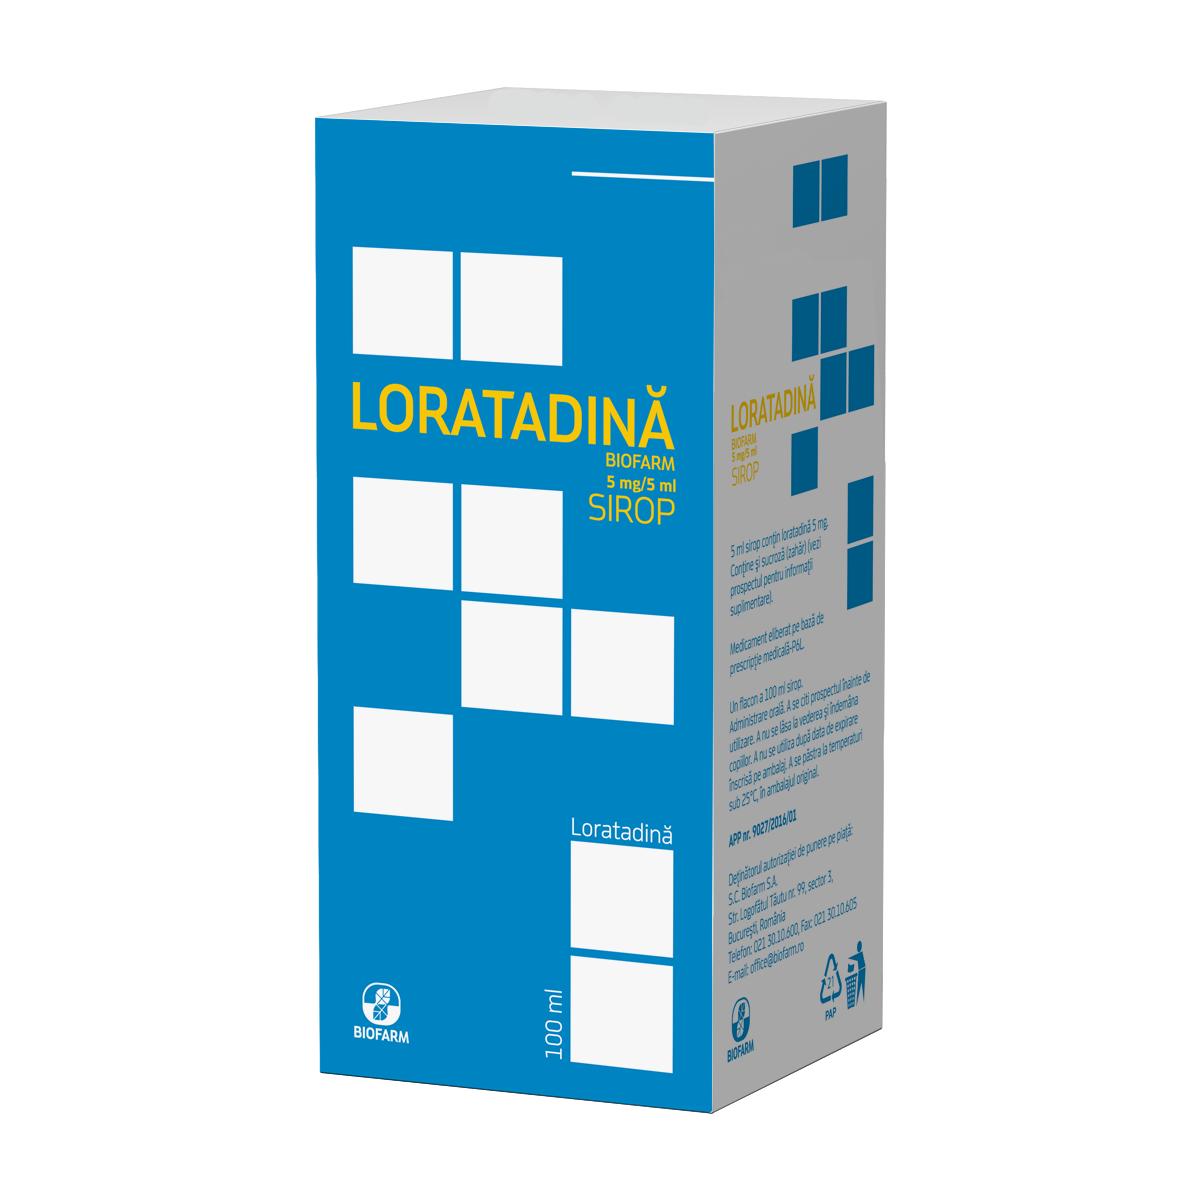 Loratadina Biofarm